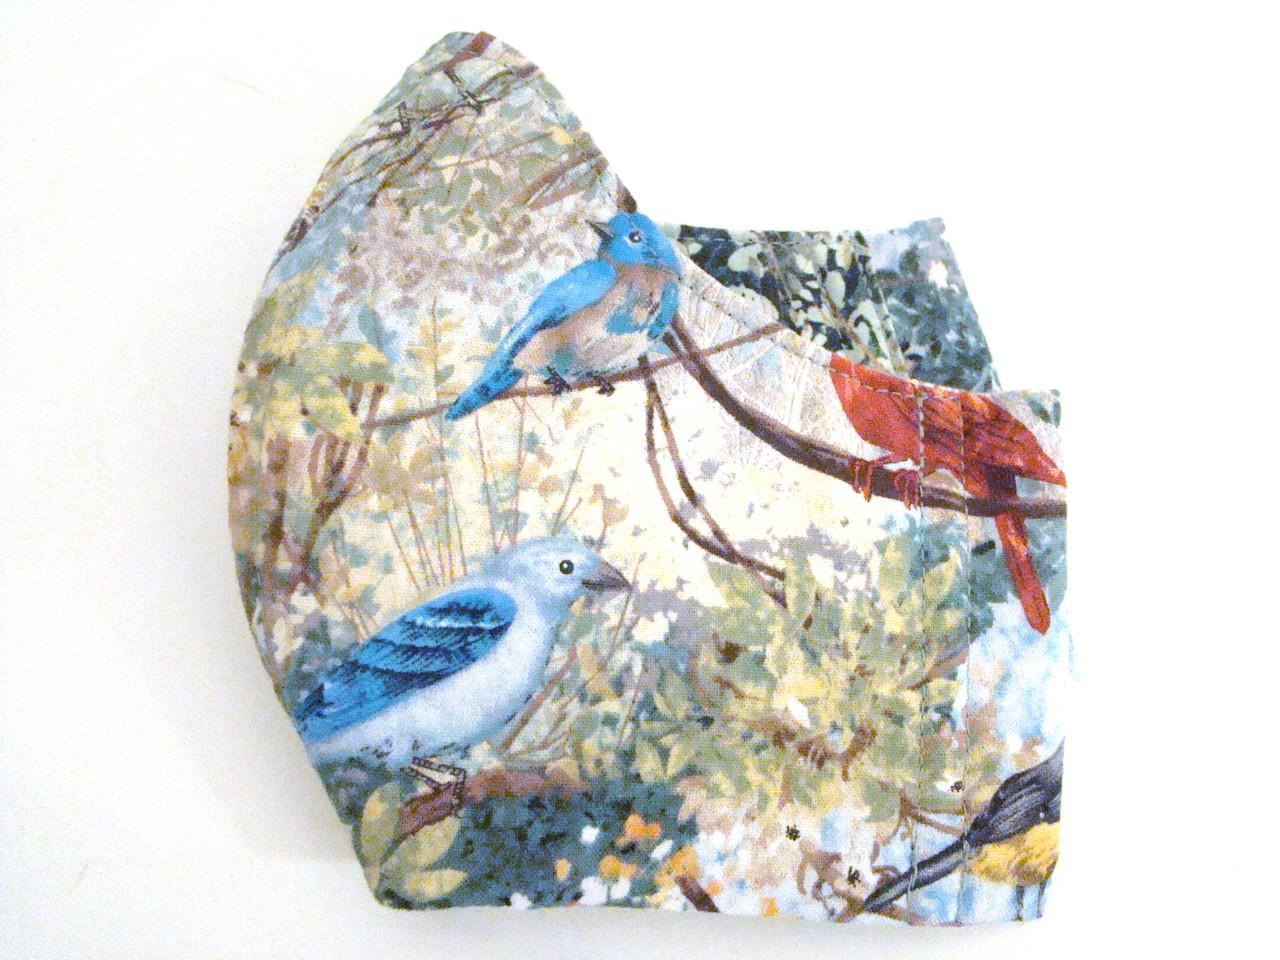 Red Cardinal and Bluebird (FM-REDCARDINAL)